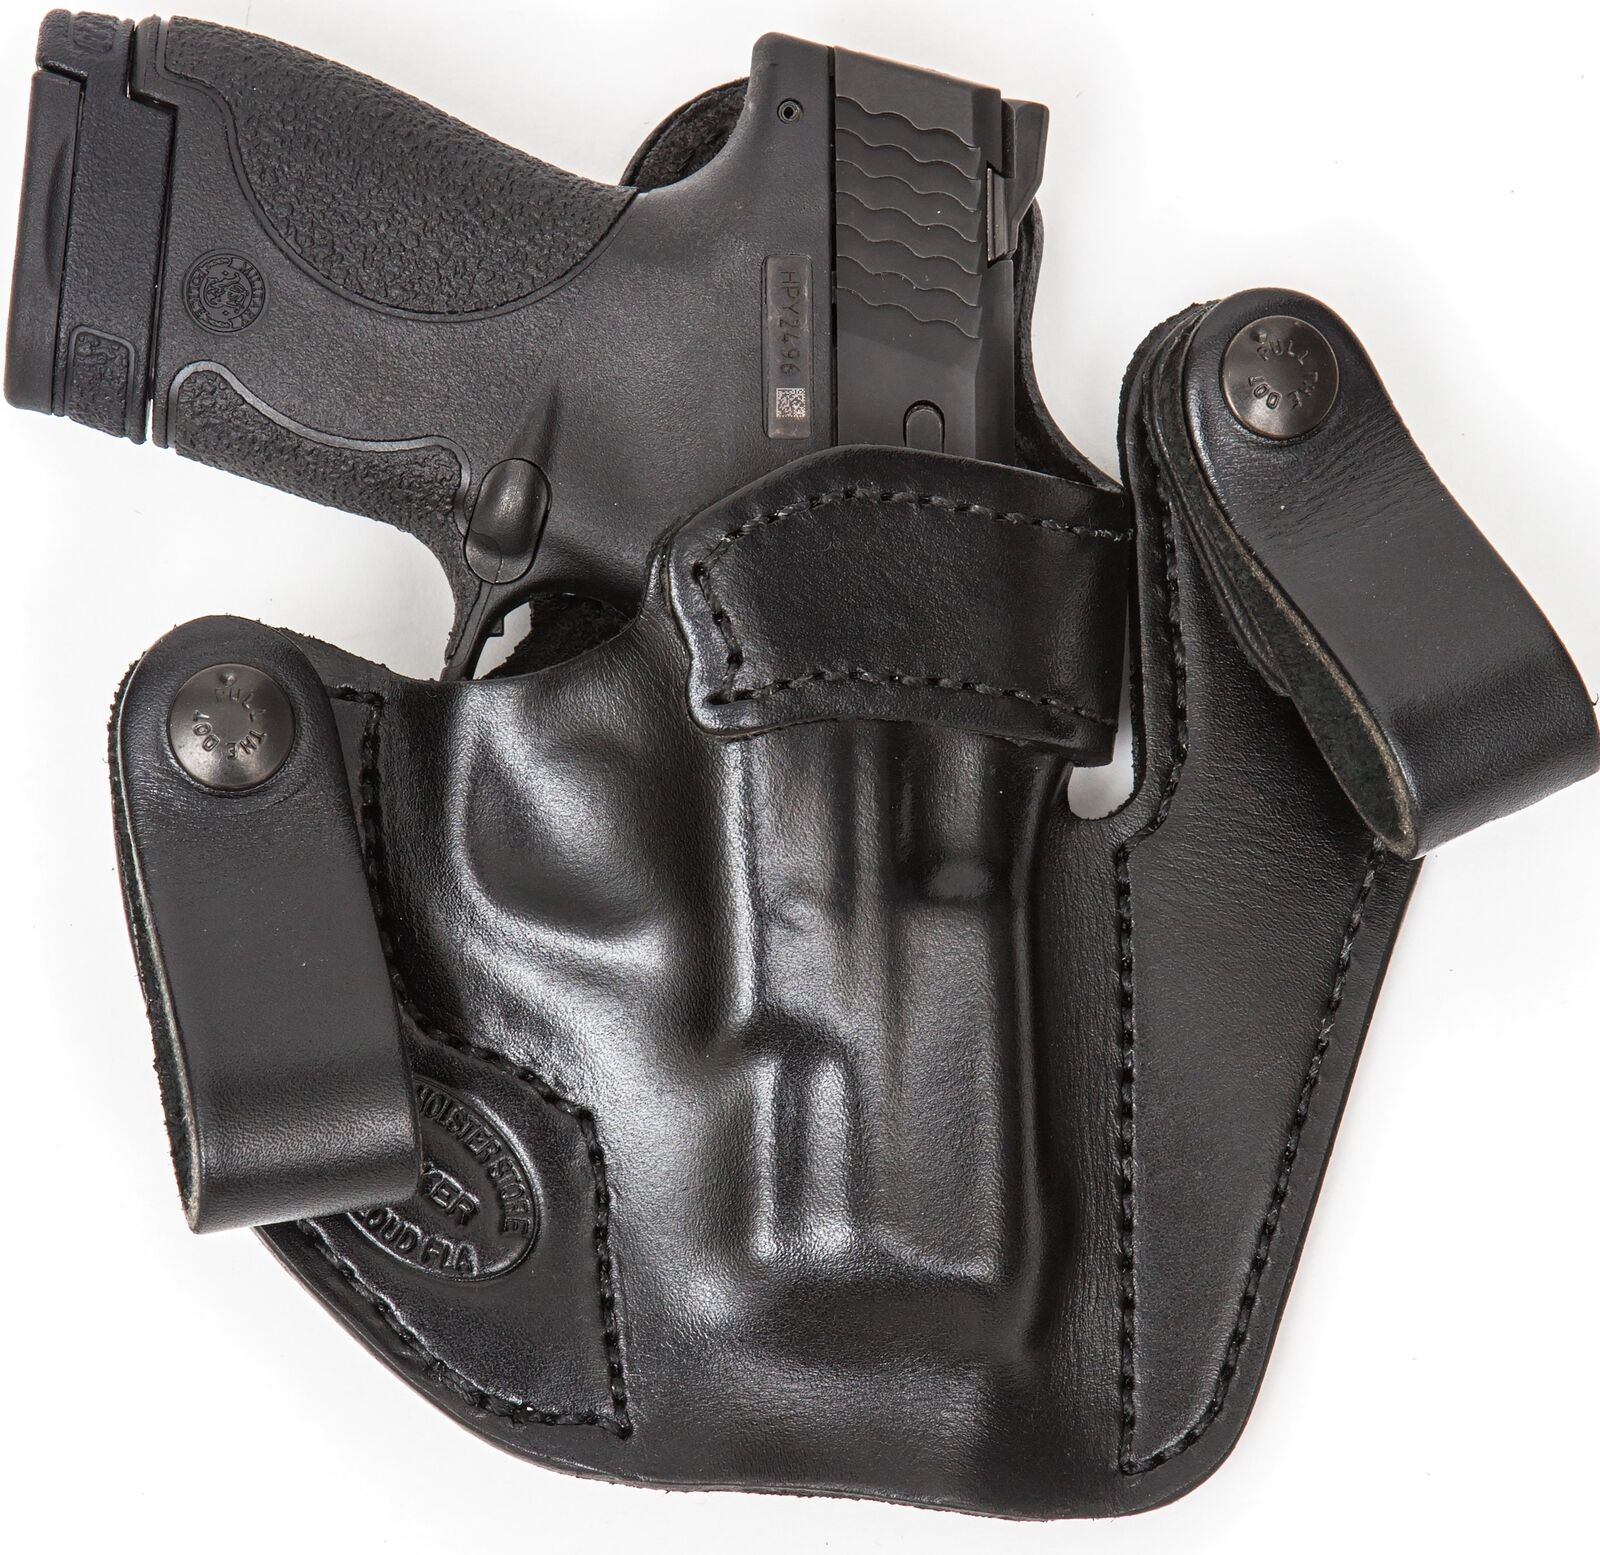 Xtreme llevar llevar llevar RH LH IWB Cuero Funda Pistola para Canik 55 0d73c4